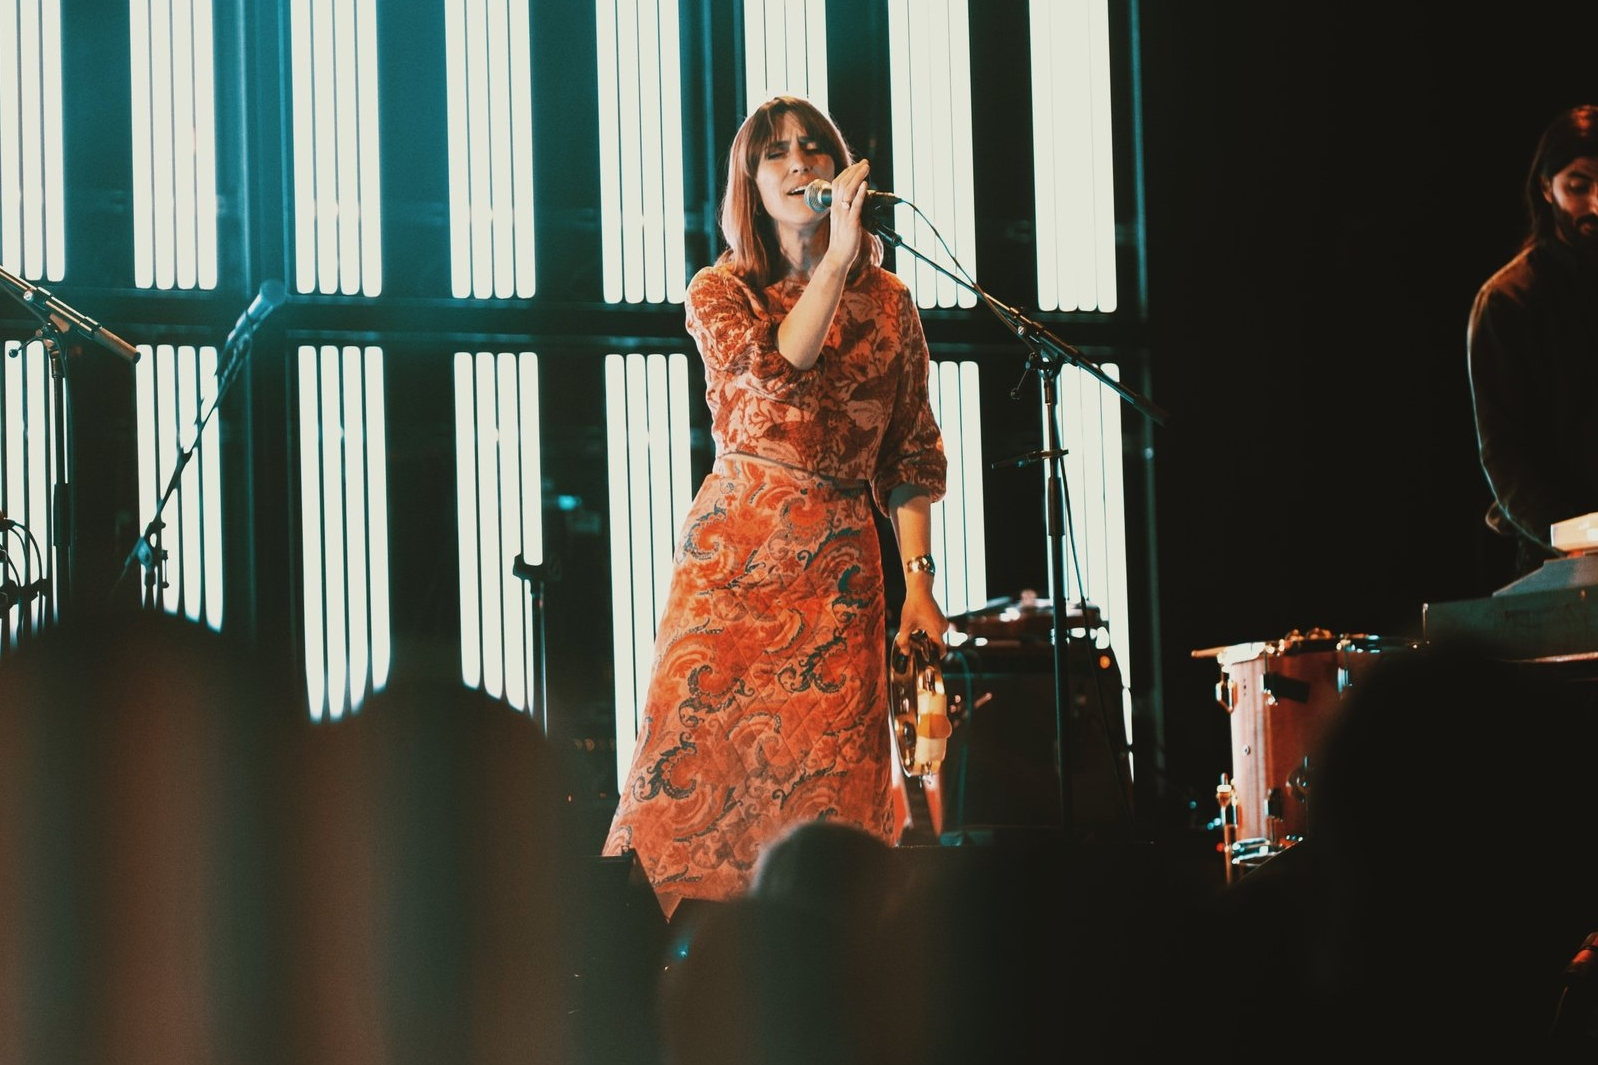 Feist Music Love Photo by Adele Sakey